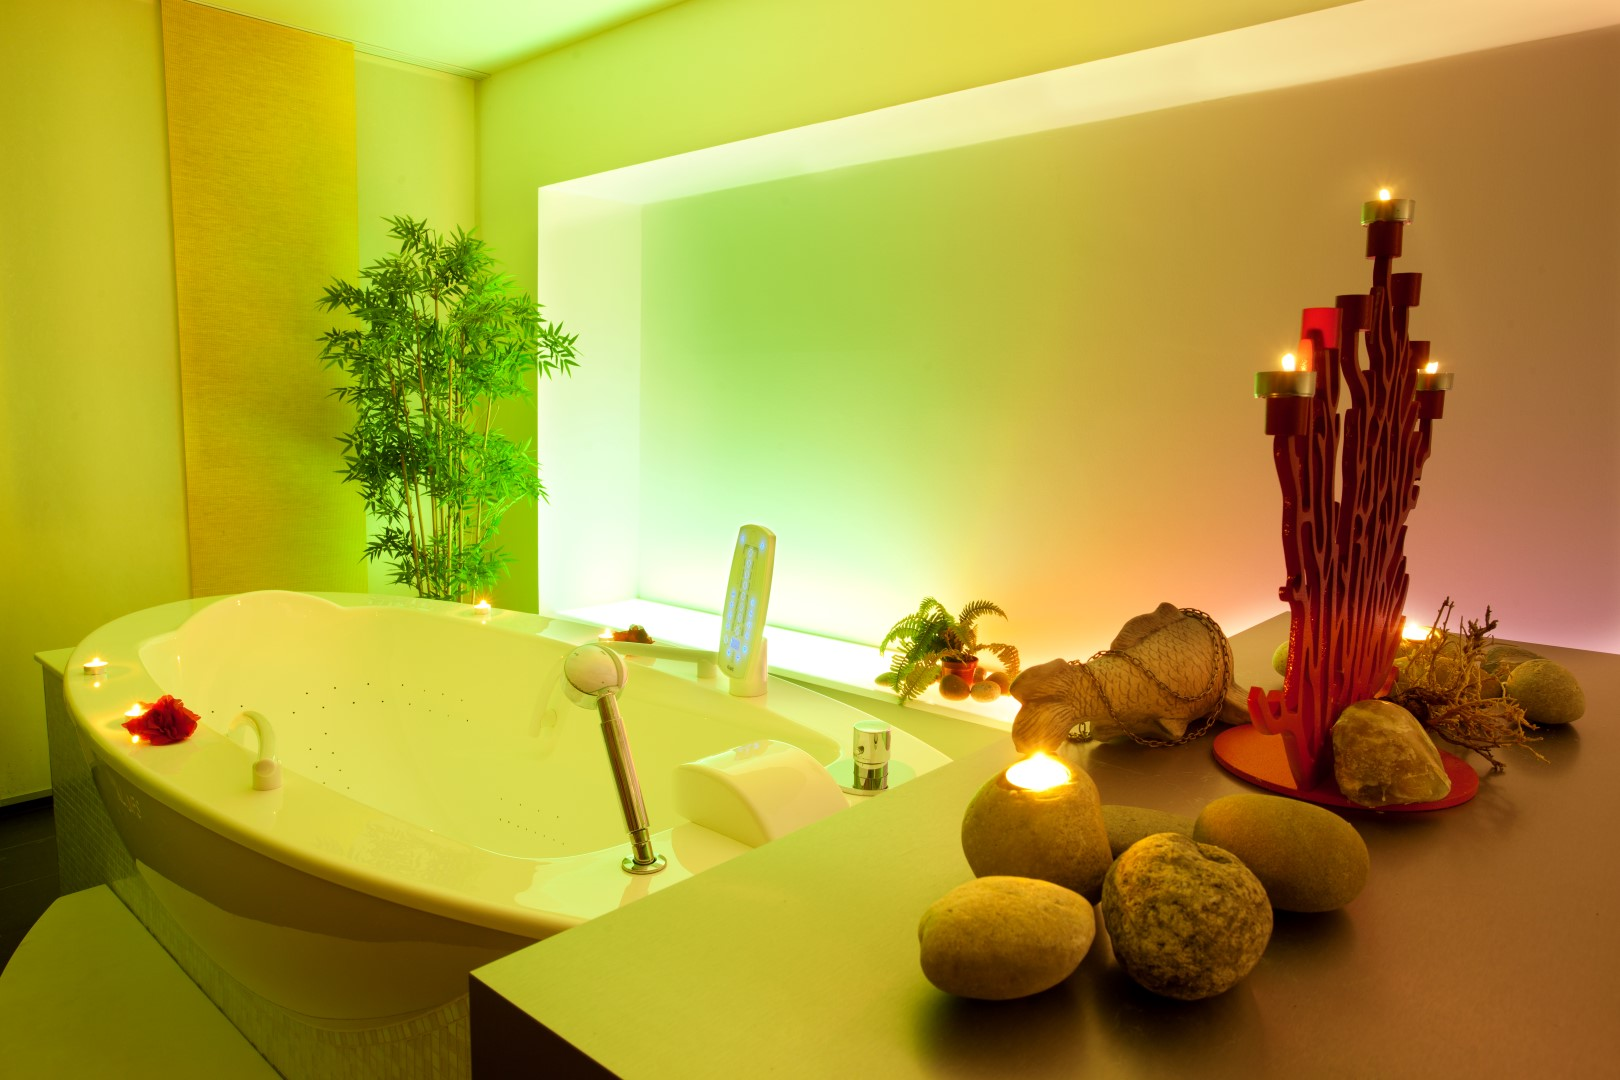 Göbel´s Vital Hotel Bad Sachsa - Wellnessraum